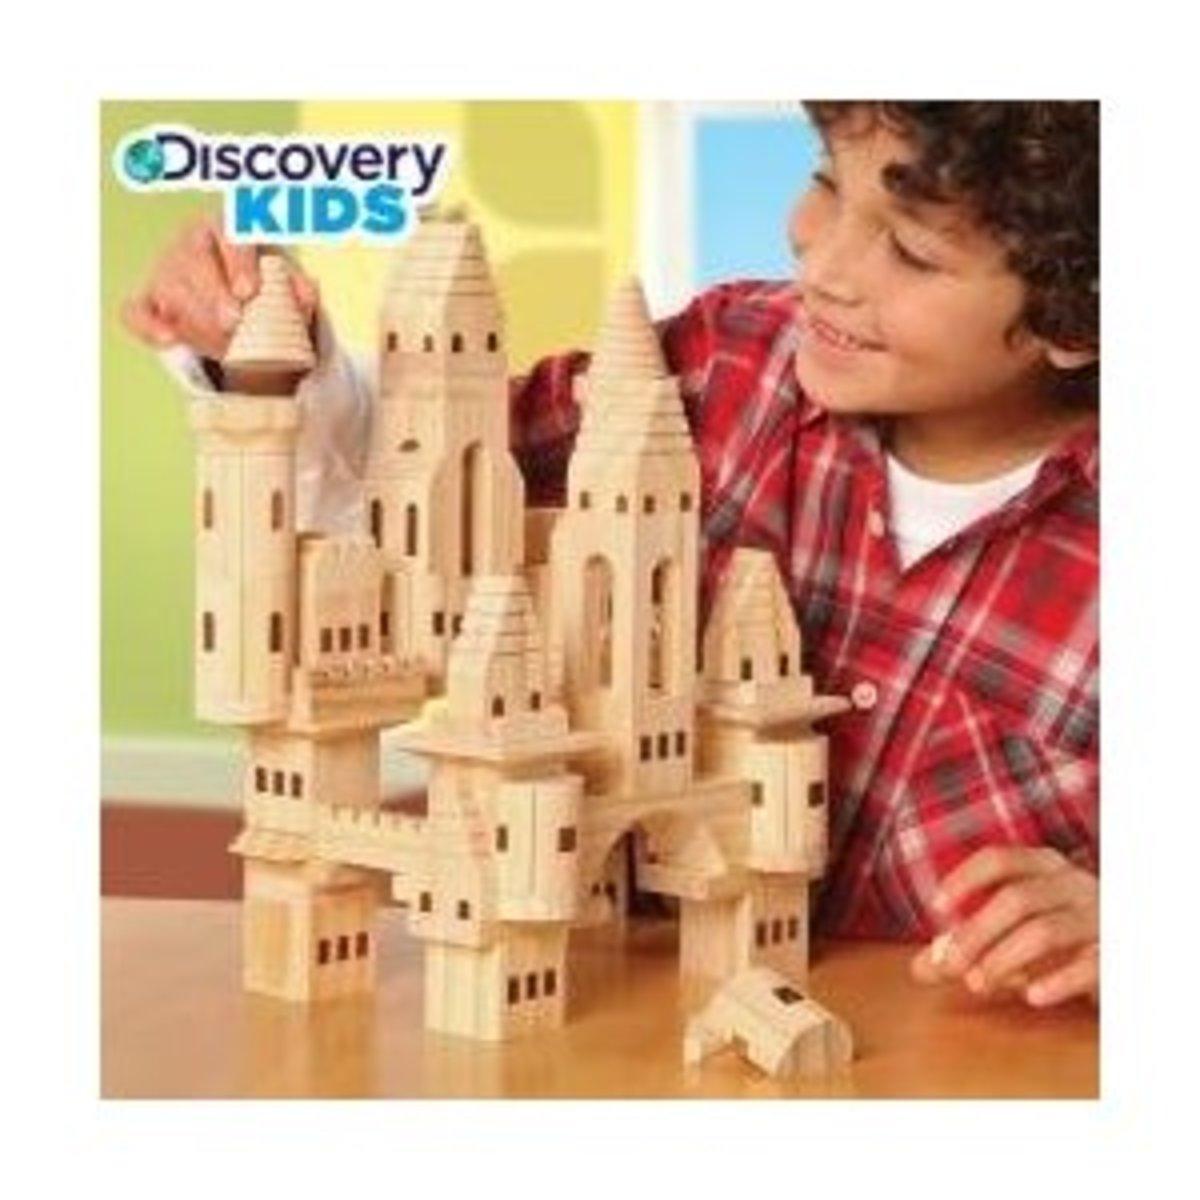 toy-castles-for-children-kids-wooden-castles-cheap-wood-toy-castles-for-sale